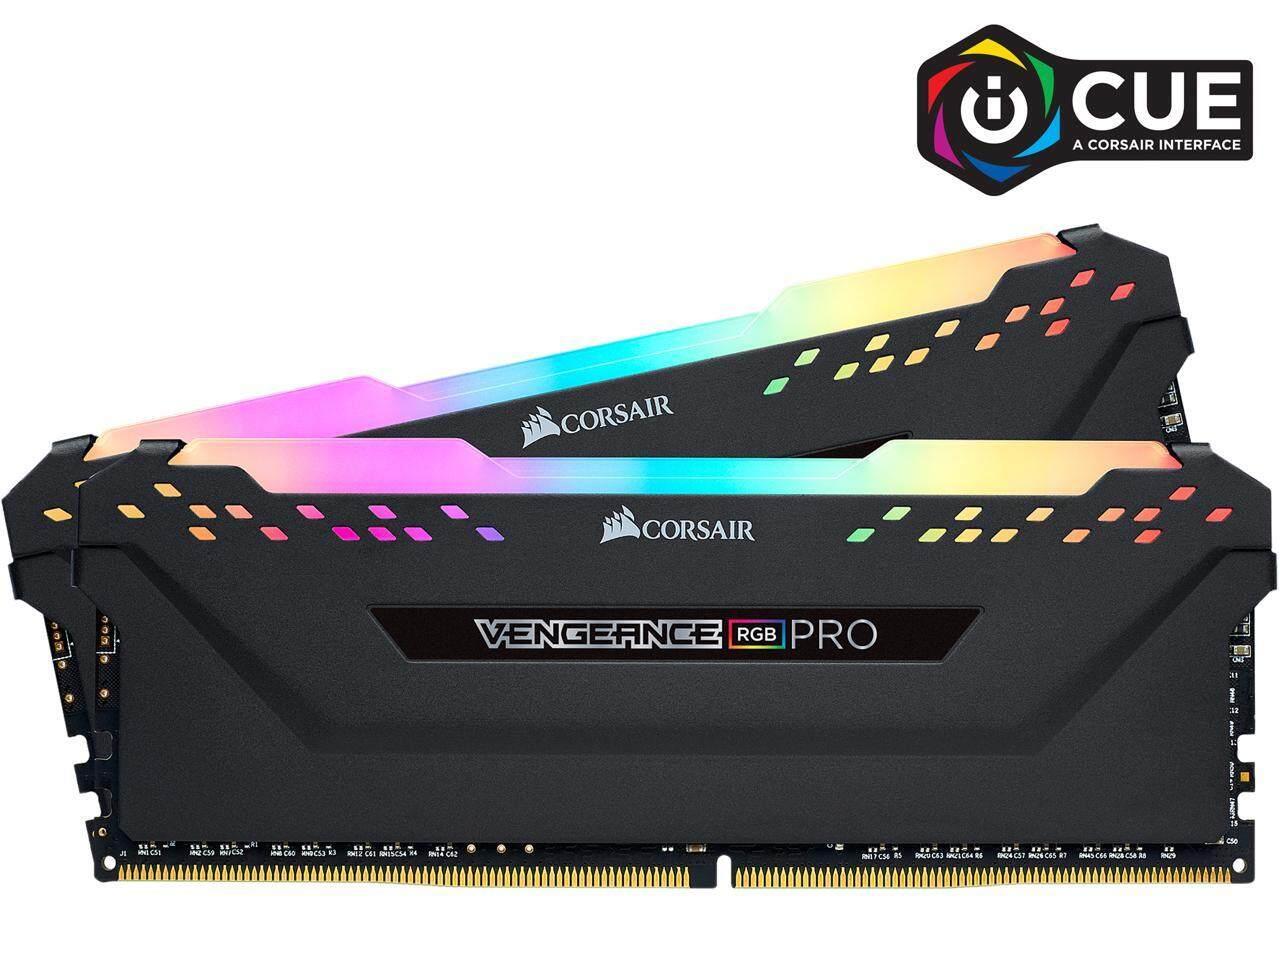 Corsair Desktop DDR4 Vengeance RGB PRO PC3200 (2x16GB) 32GB RAM (CMW32GX4M2E3200C16) BLACK